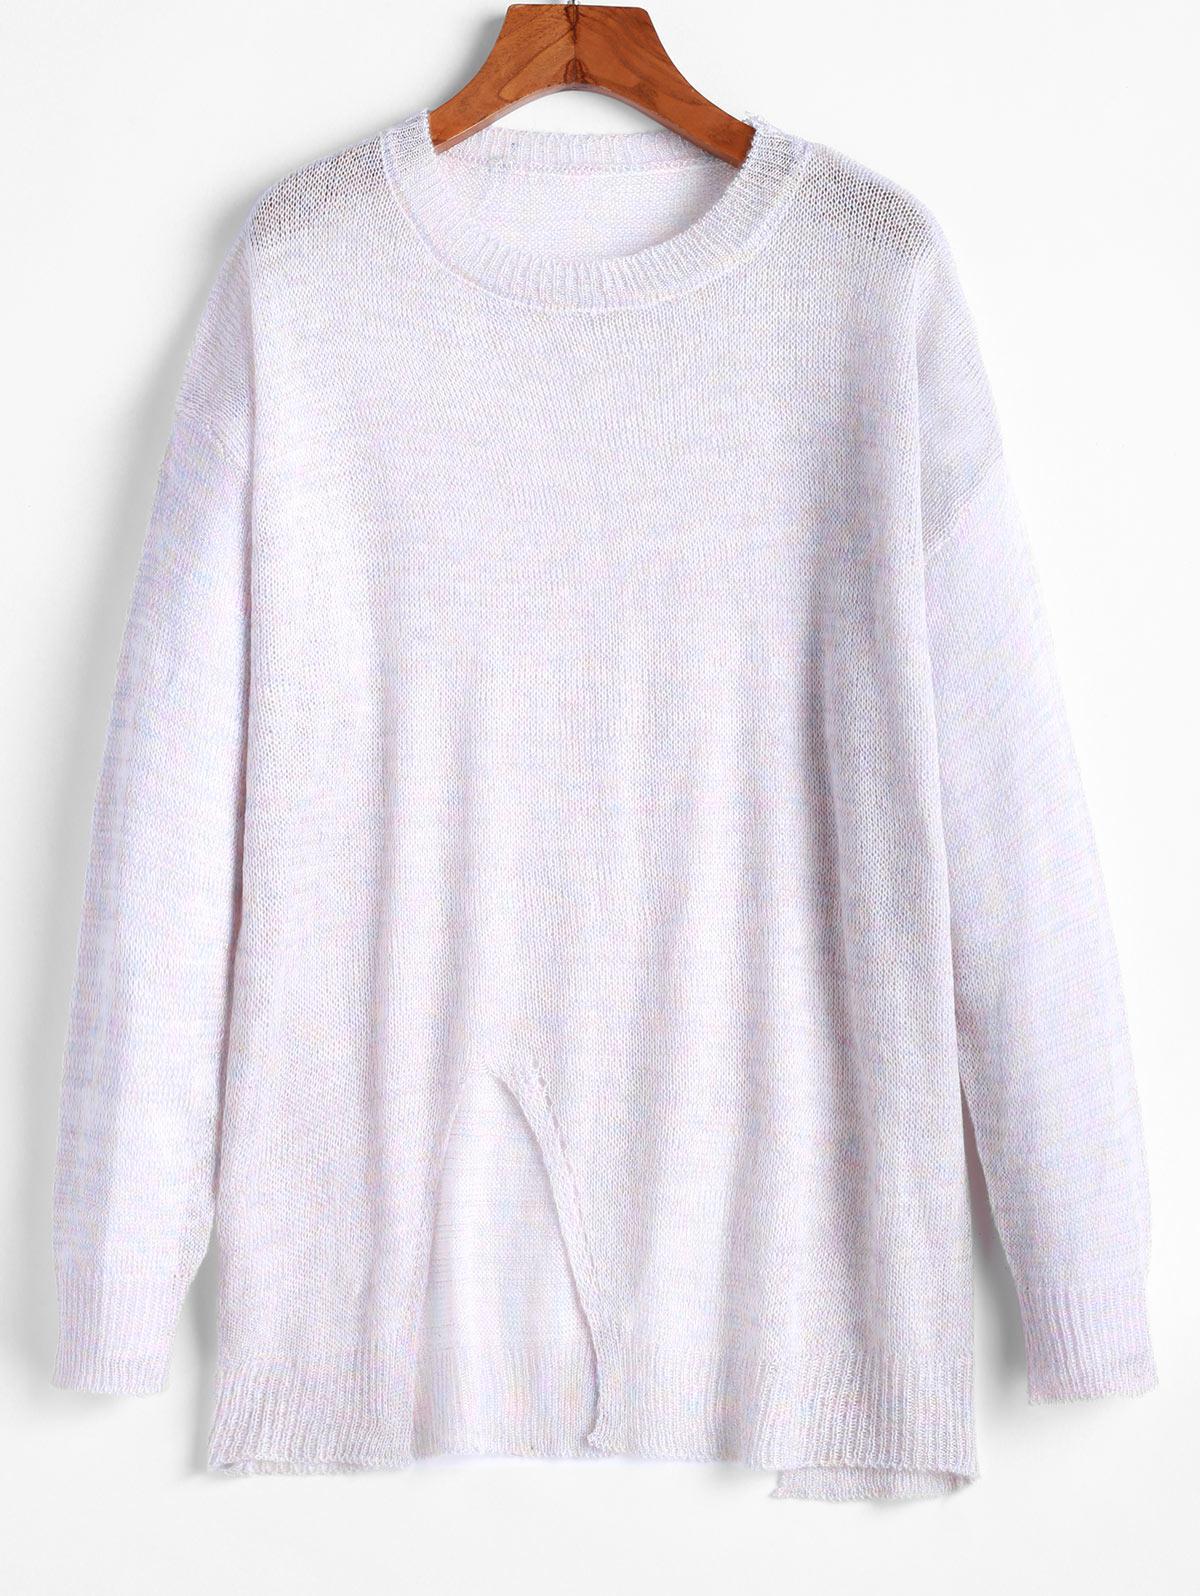 ZAFUL Metallic Thread Slit Drop Shoulder Tunic Sweater